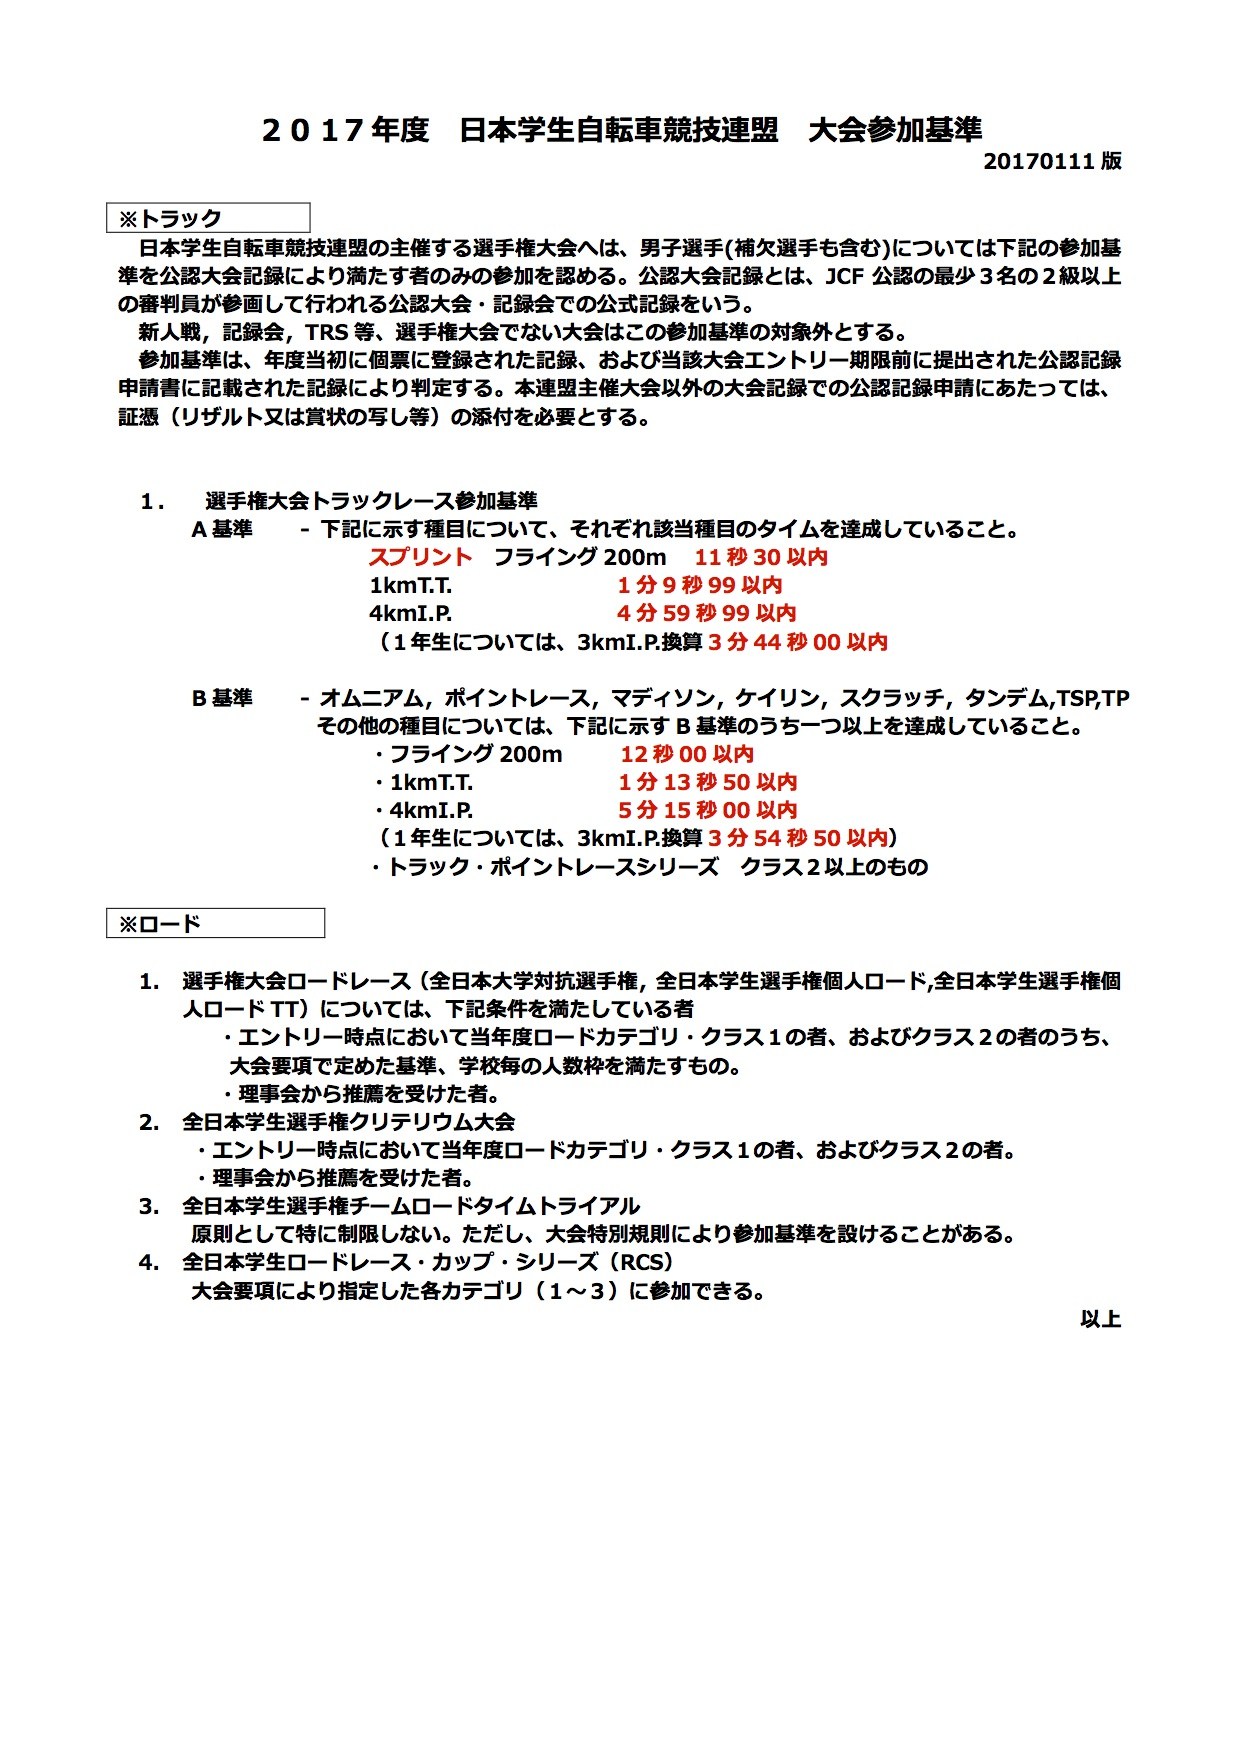 17sankakijyun_daihyoshisin170111_01